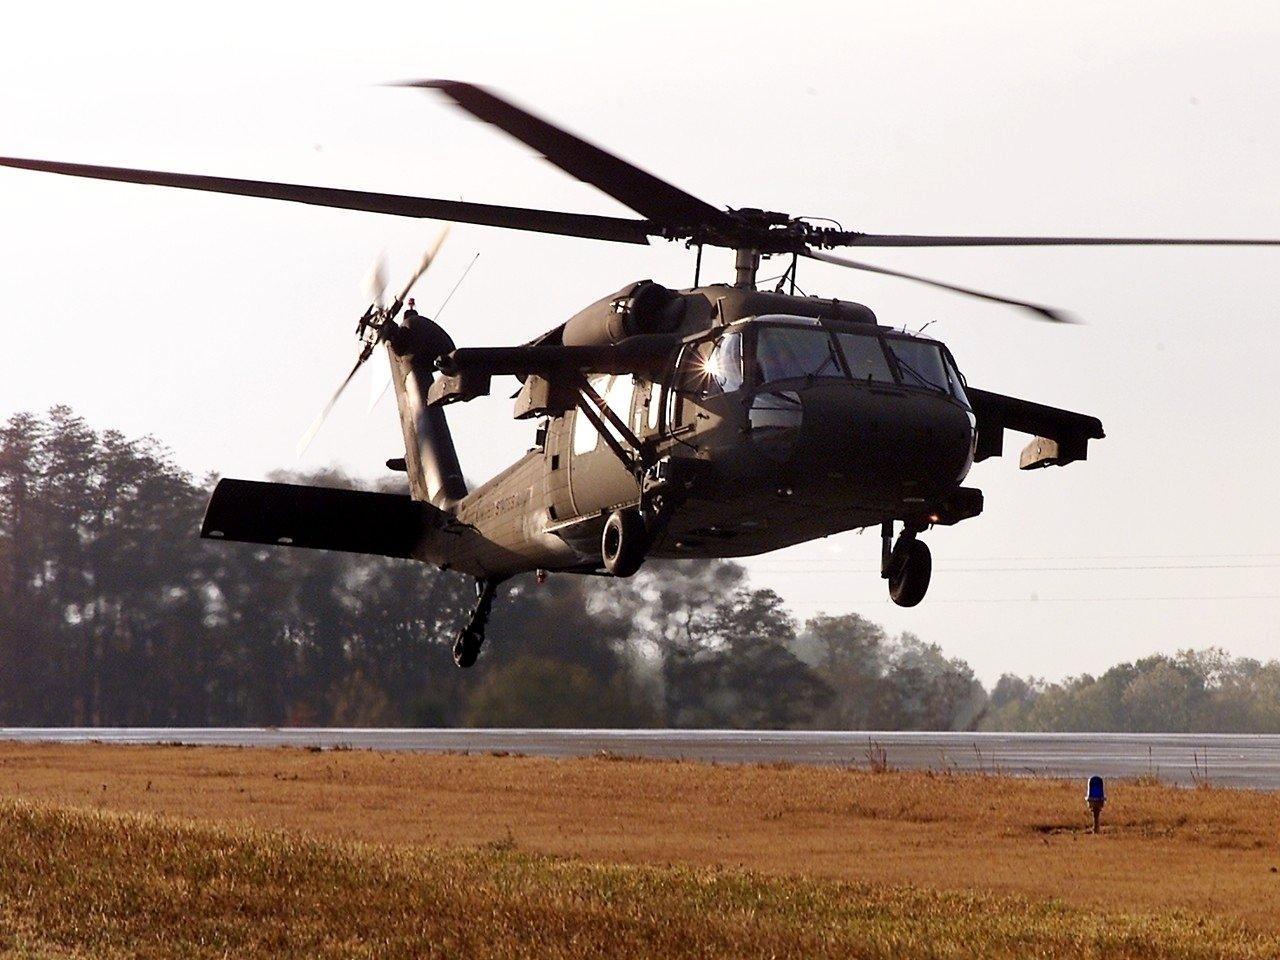 http://4.bp.blogspot.com/-kBwa27voEhE/TrCBdWMDTkI/AAAAAAAAGhU/r3yKx0sVsh4/s1600/uh60_blackhawk.jpg